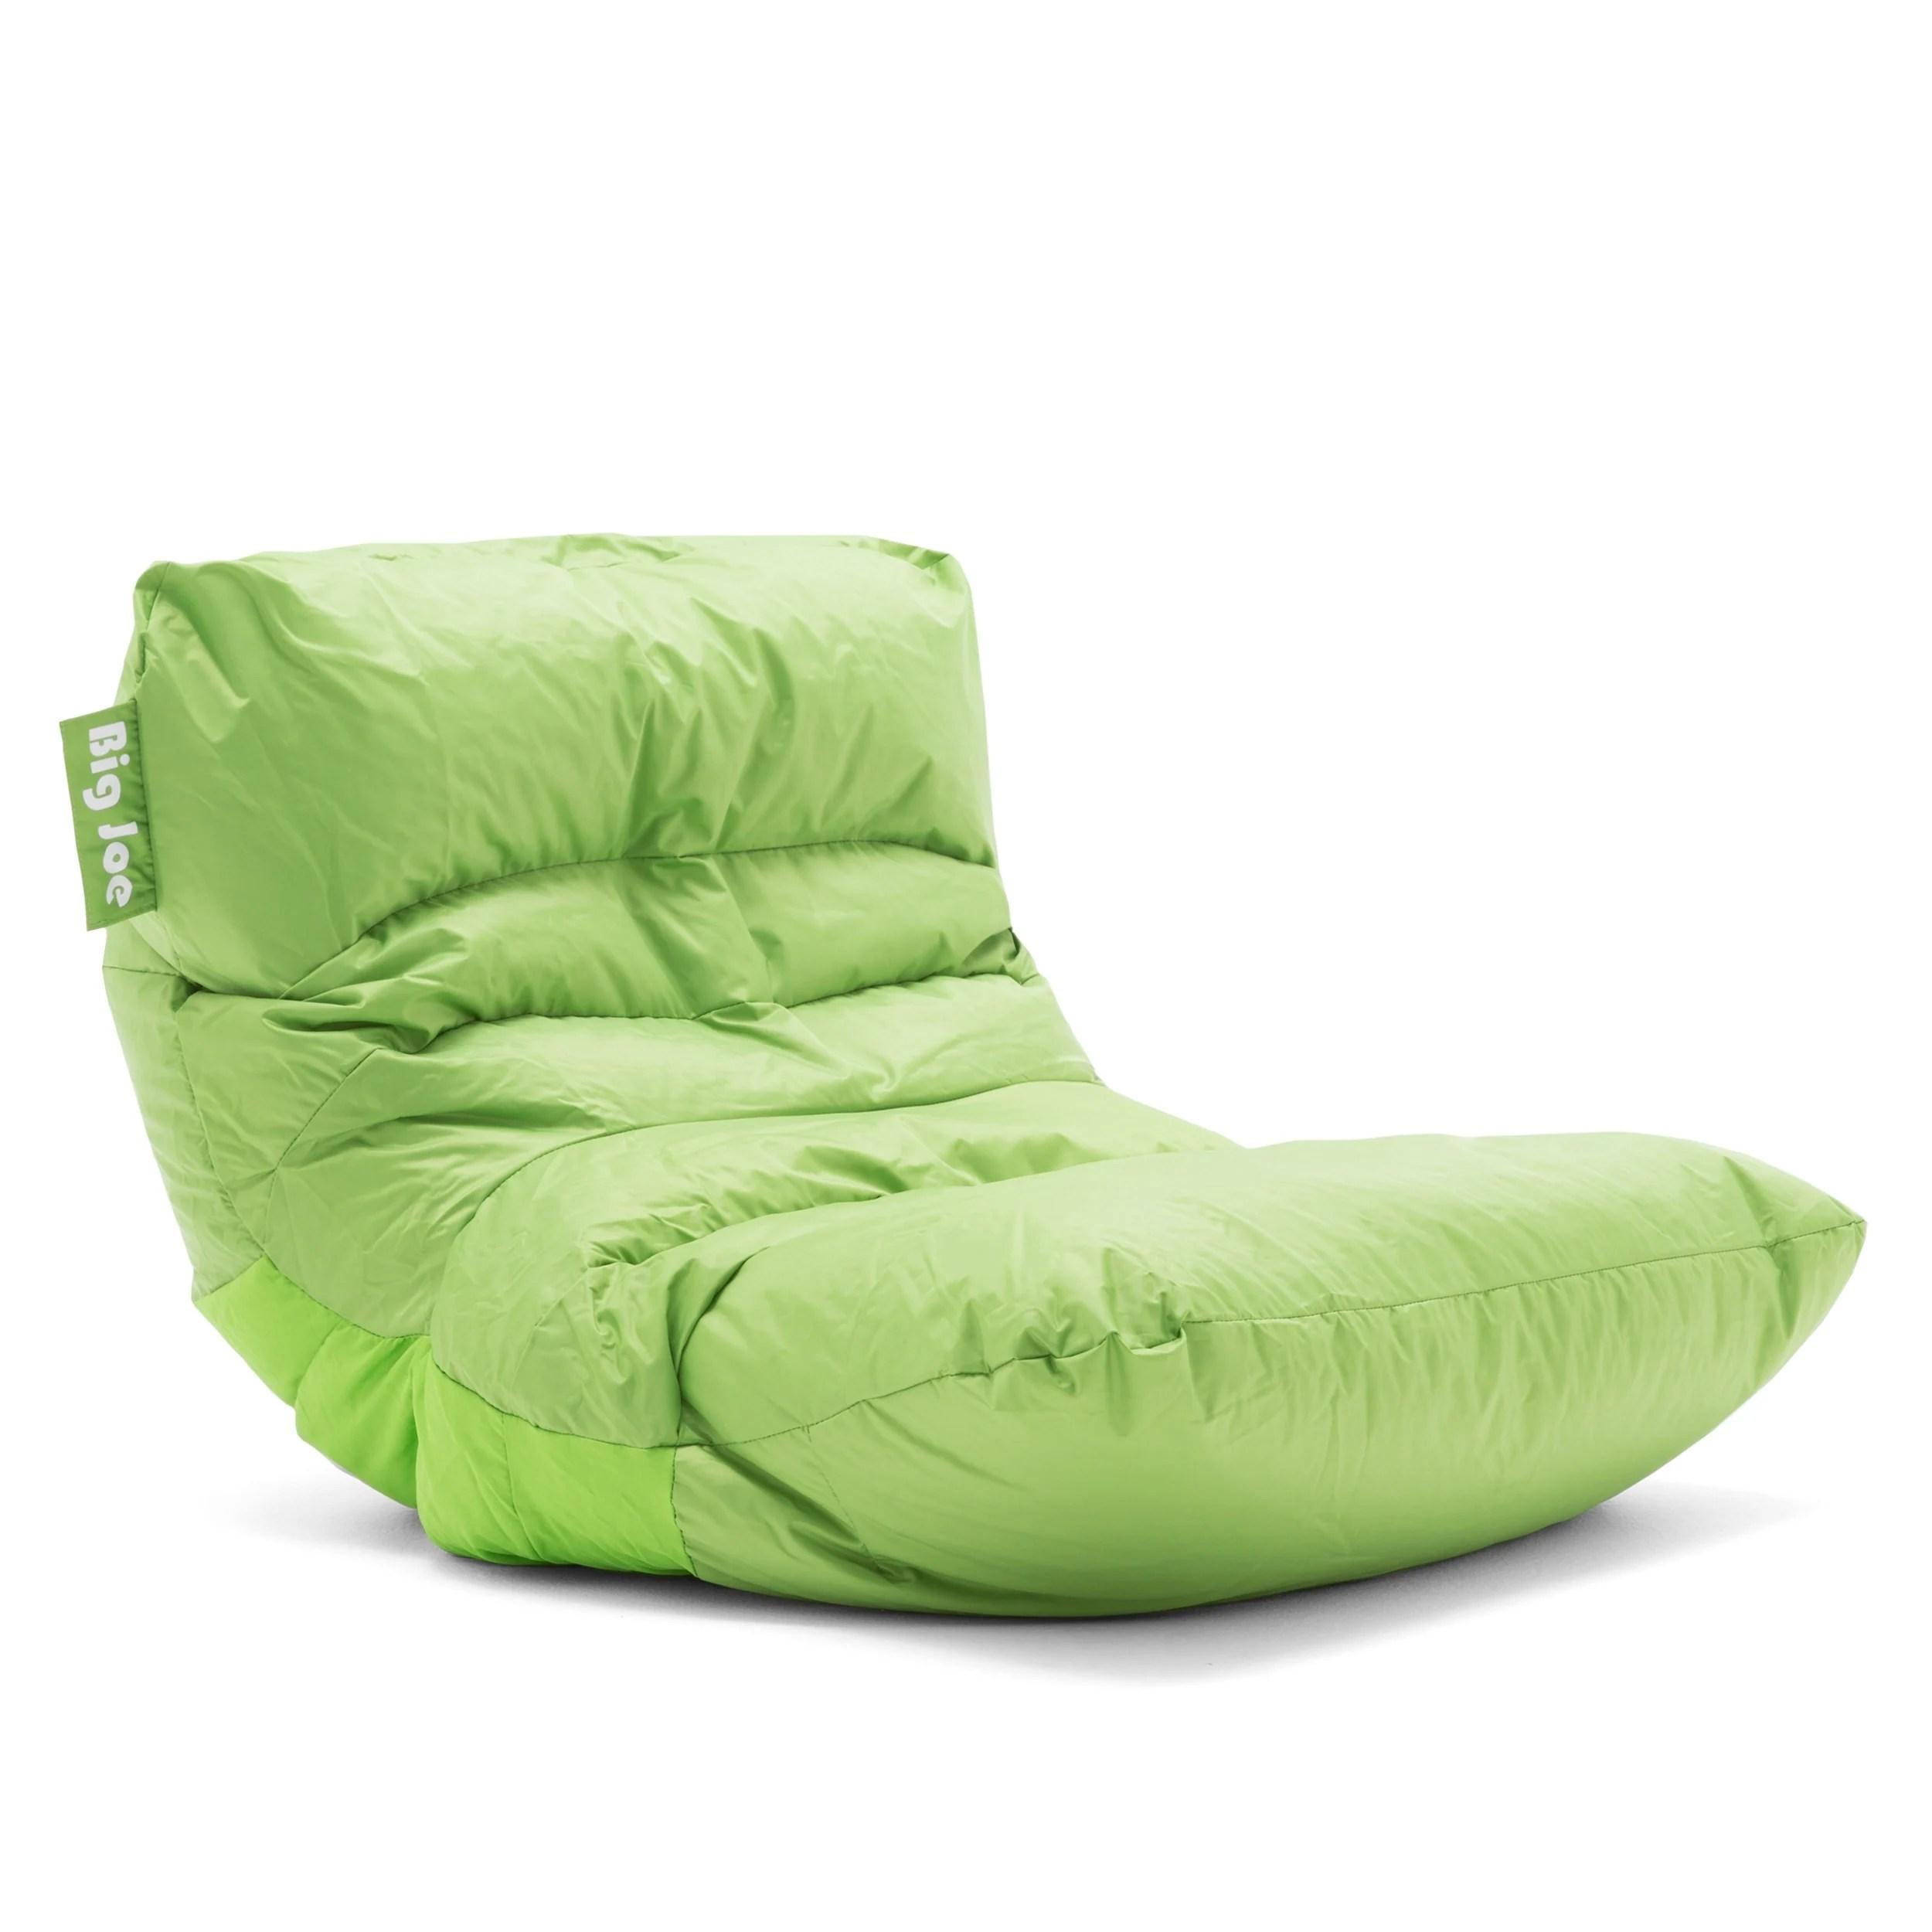 green bean bag chair mickey mouse desk shop big joe roma smartmax free shipping today overstock com 16257655